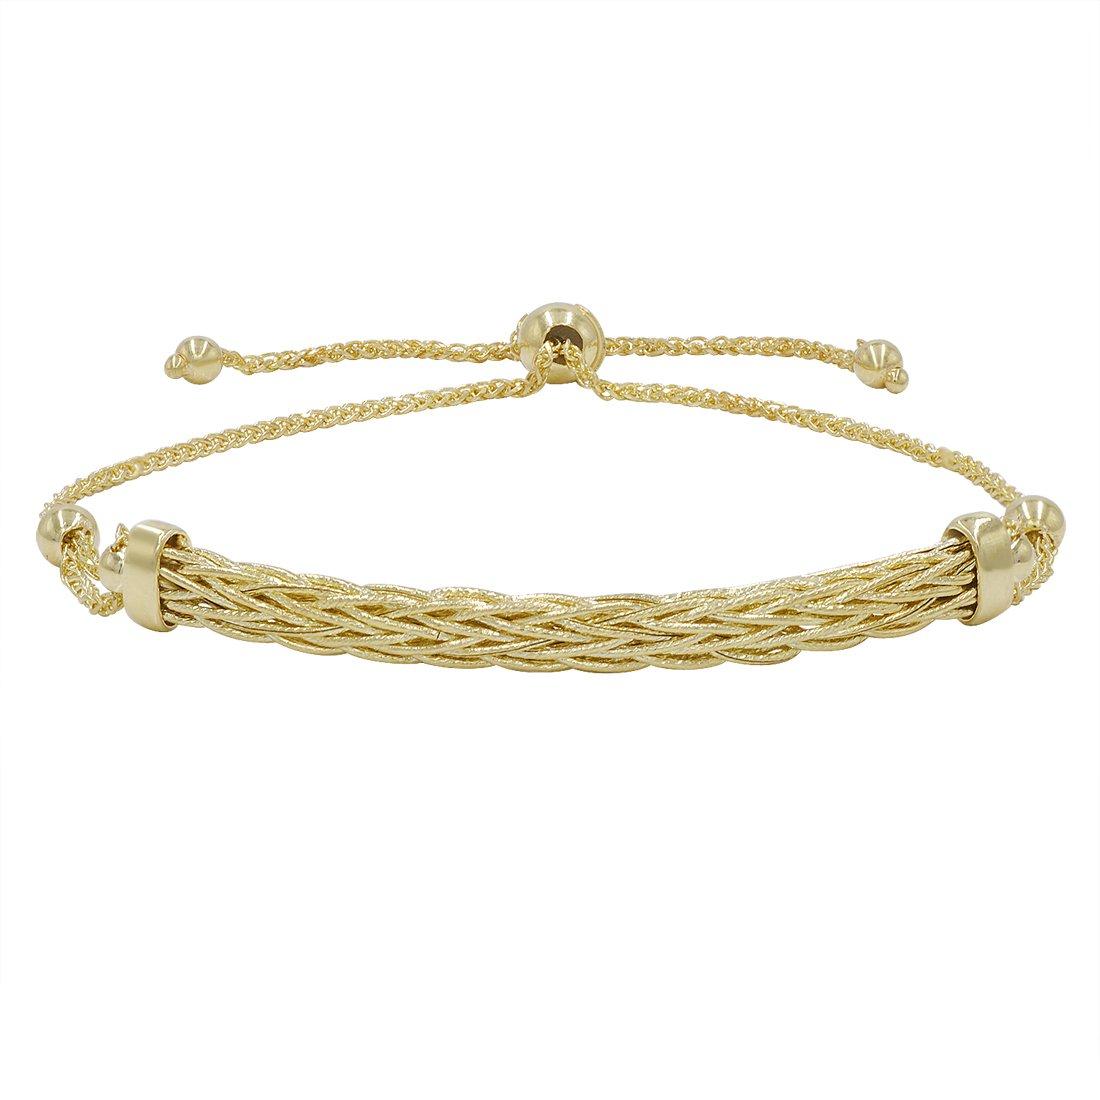 777d9cbd7127ad Amazon.com: 14k Yellow Gold Diamond Cut Bolo Bracelet (Adjustable up to 9  1/4 in.): Jewelry